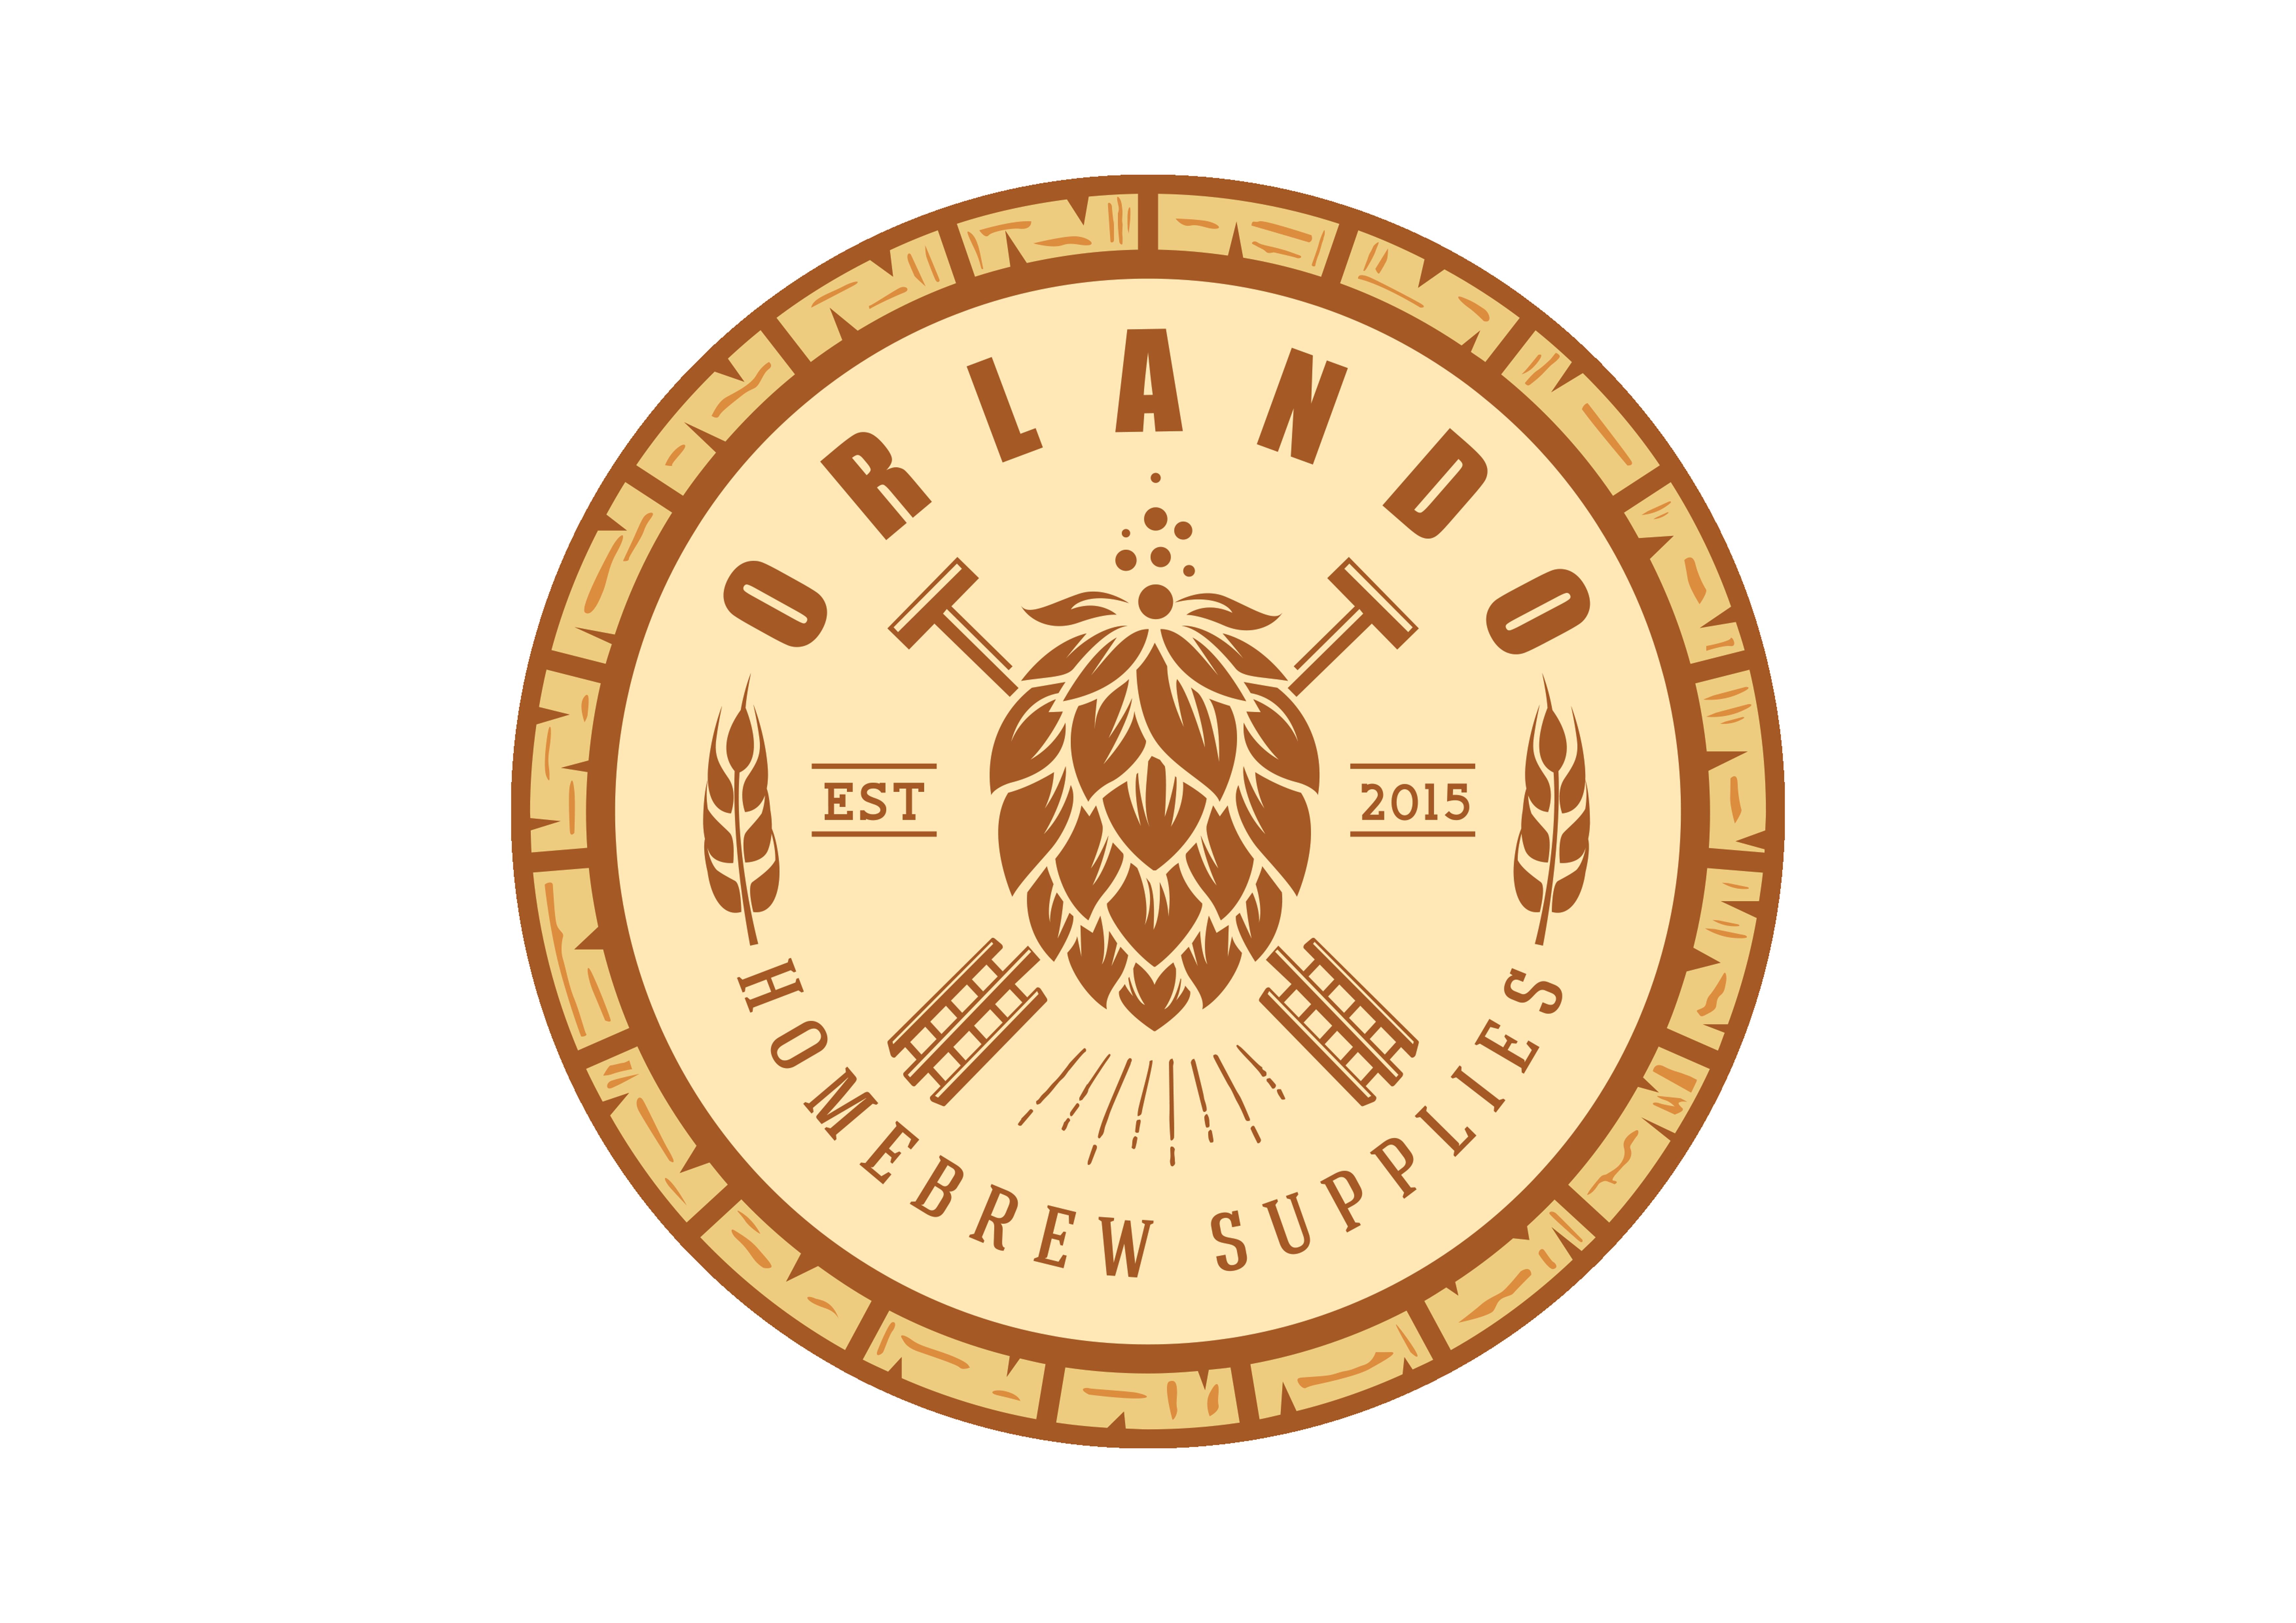 Need a new logo for Orlando Homebrew Supplies